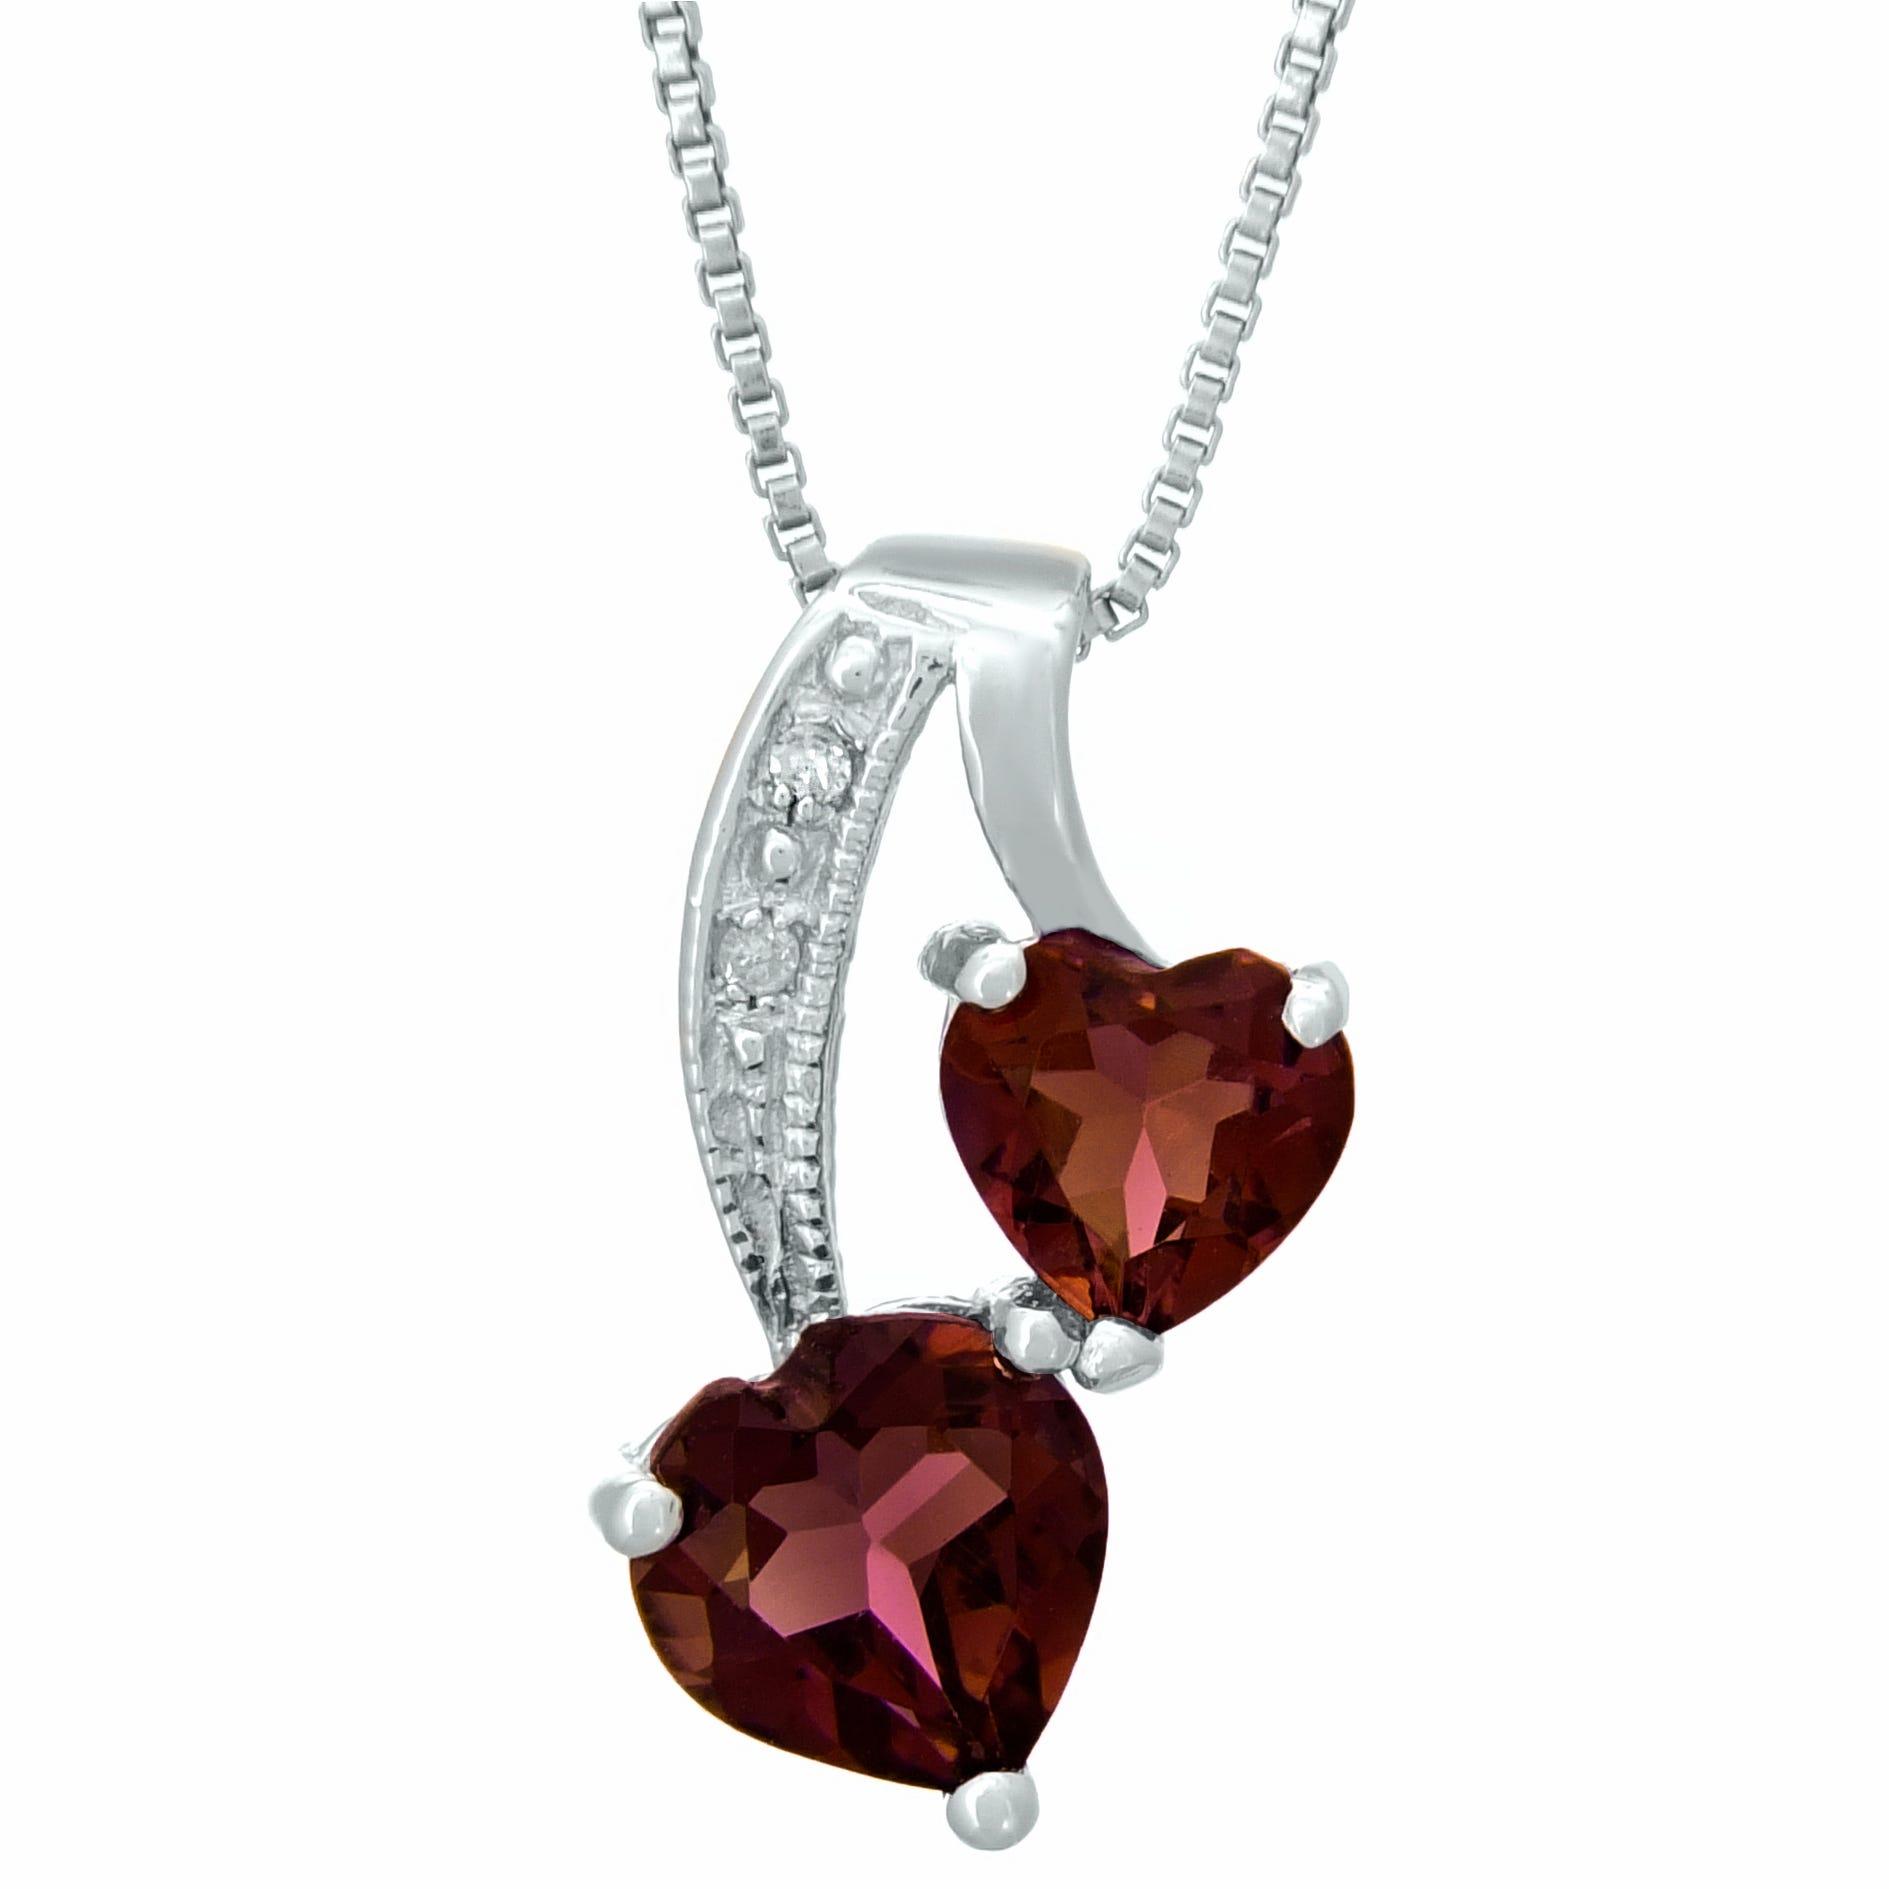 Heart Genuine Garnet Diamond Sterling Silver Pendant 18